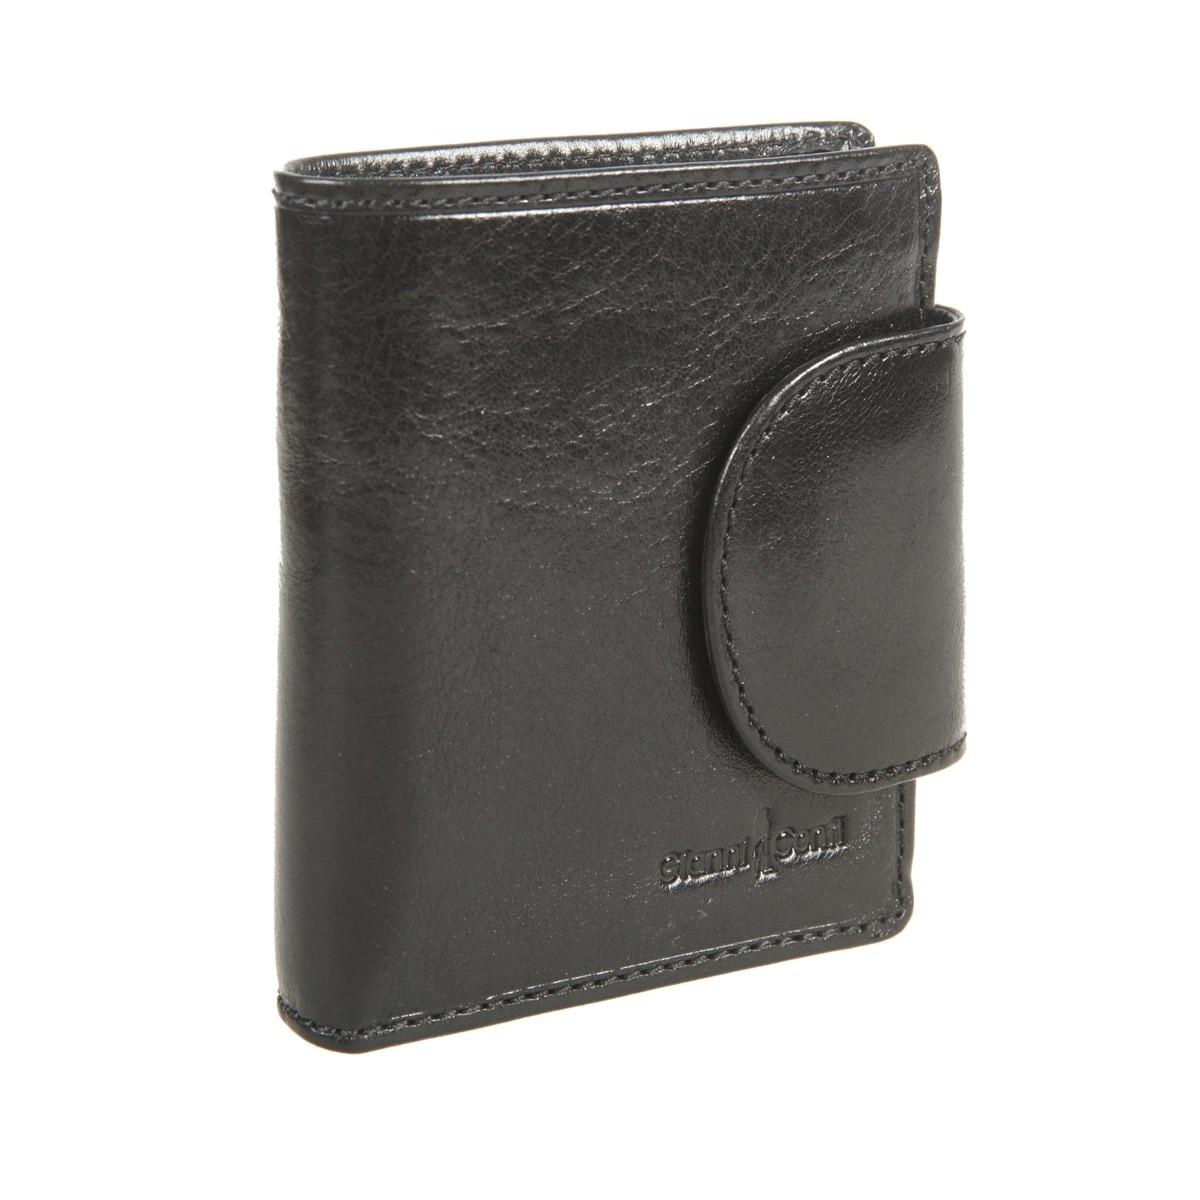 Purse Gianni Conti 9407472 black women s fashion pu leather messenger hobo handbag purse shoulder bag purse lady tote black